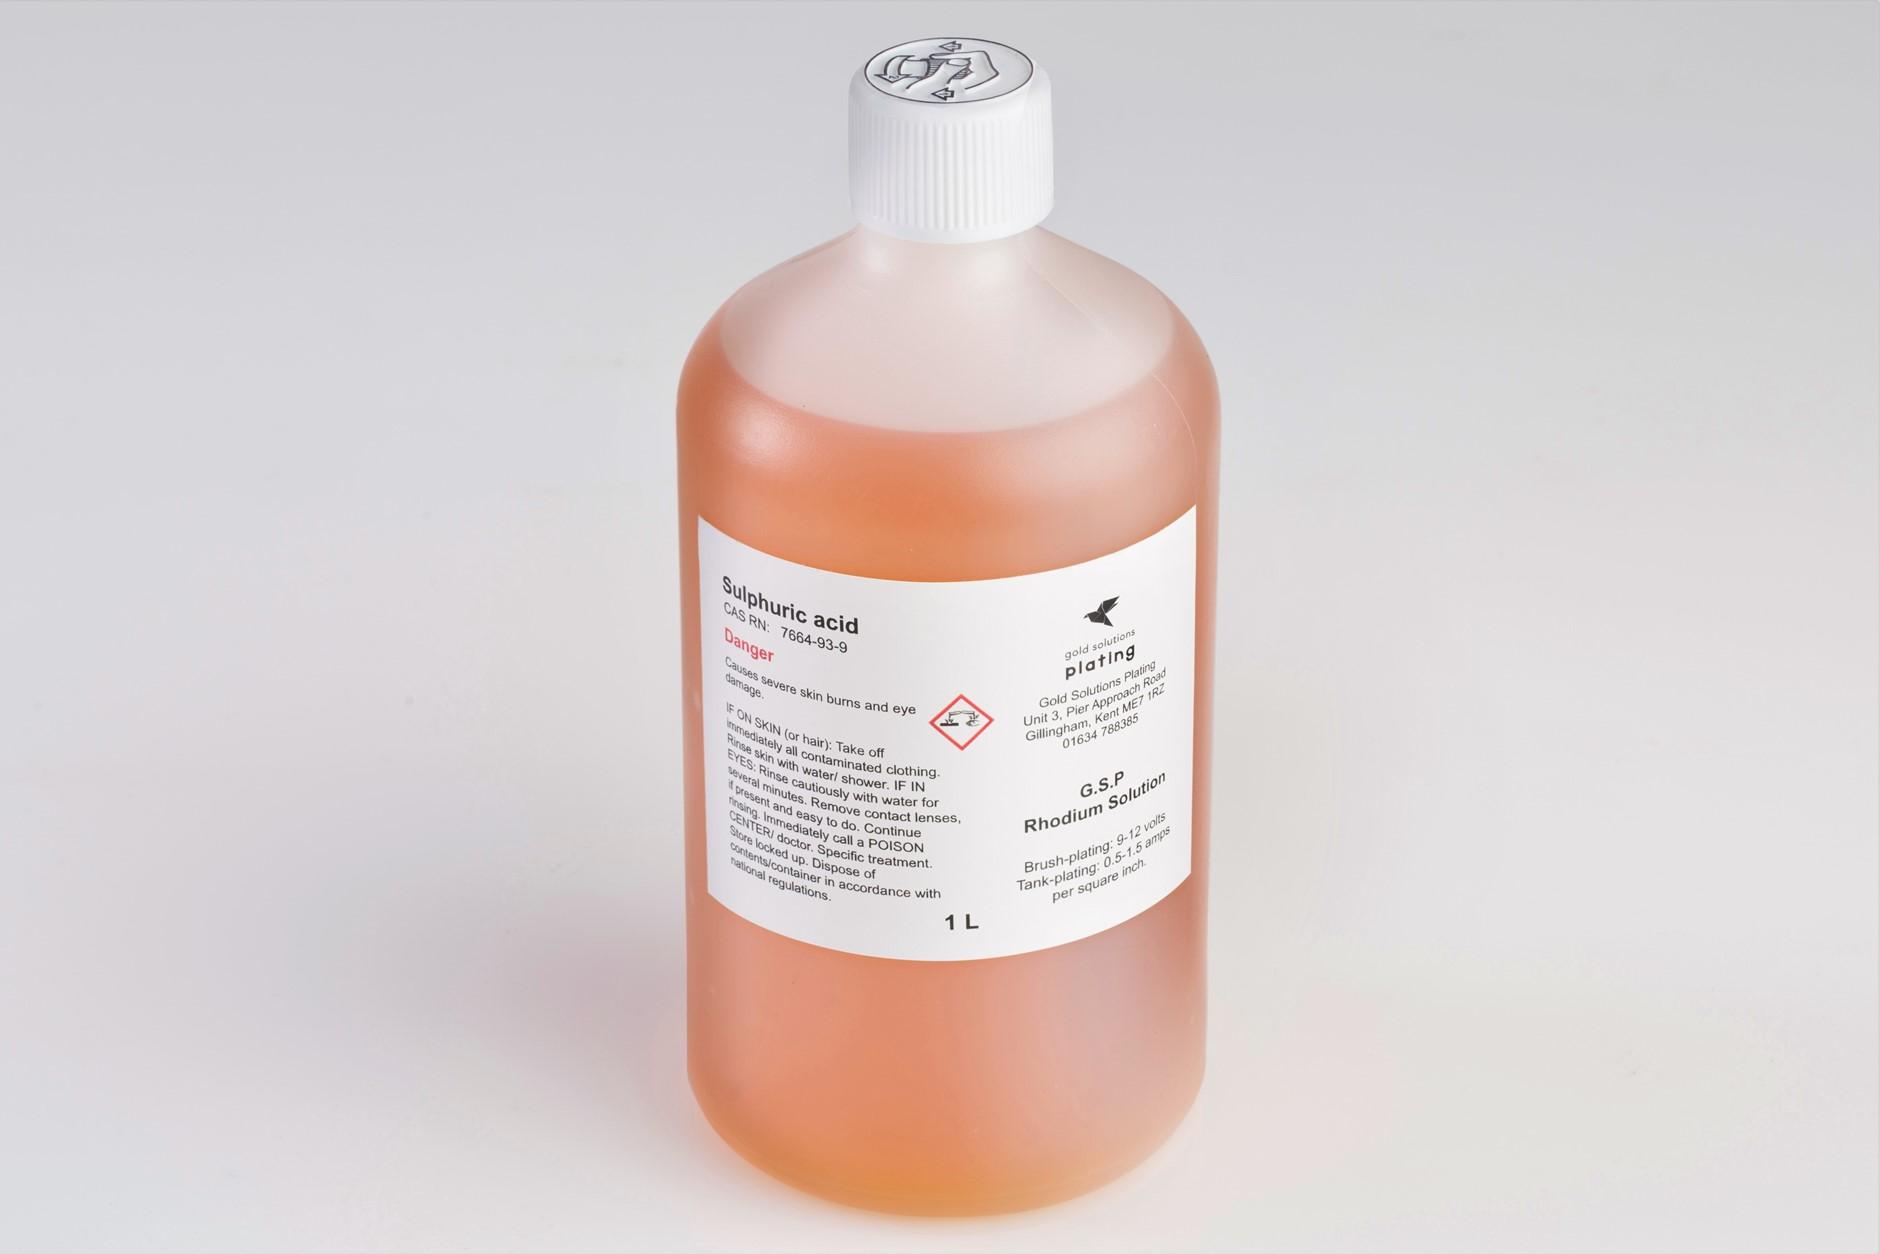 G.S.P Rhodium Plating Solution, 1 litre bottle